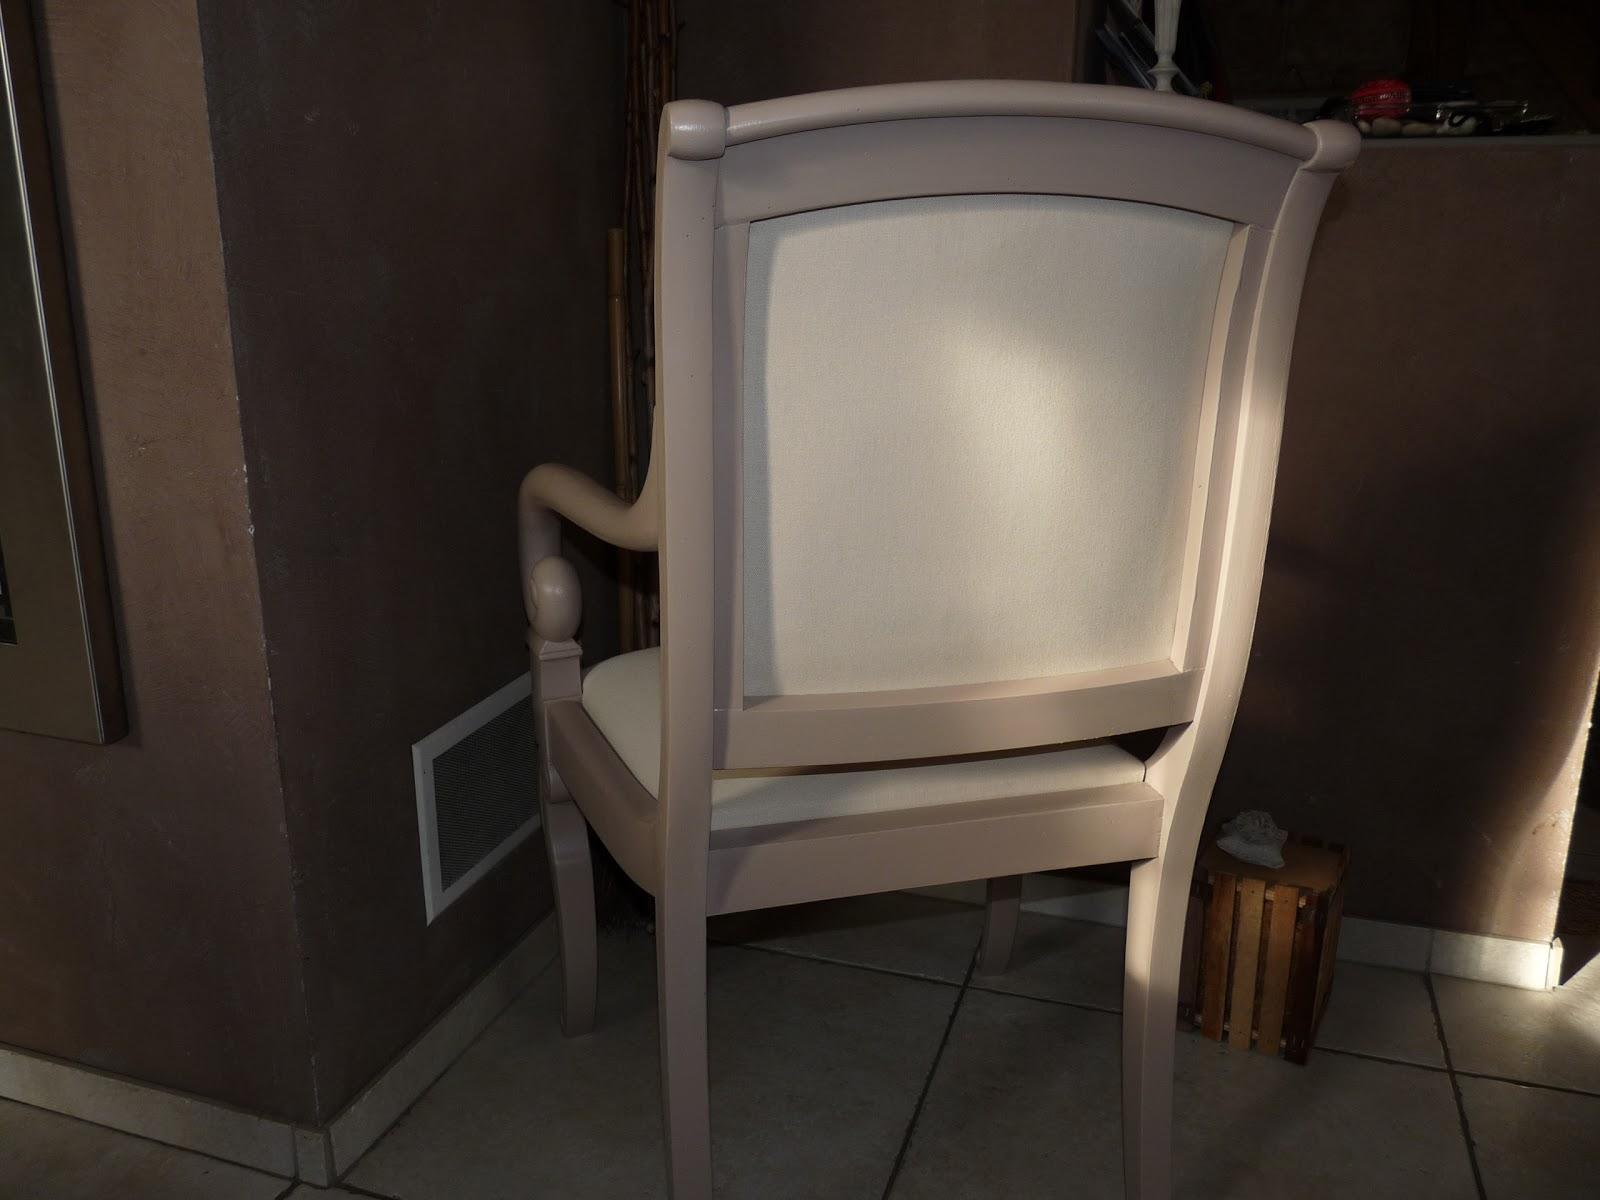 l 39 atelier de bobolina refection simple. Black Bedroom Furniture Sets. Home Design Ideas